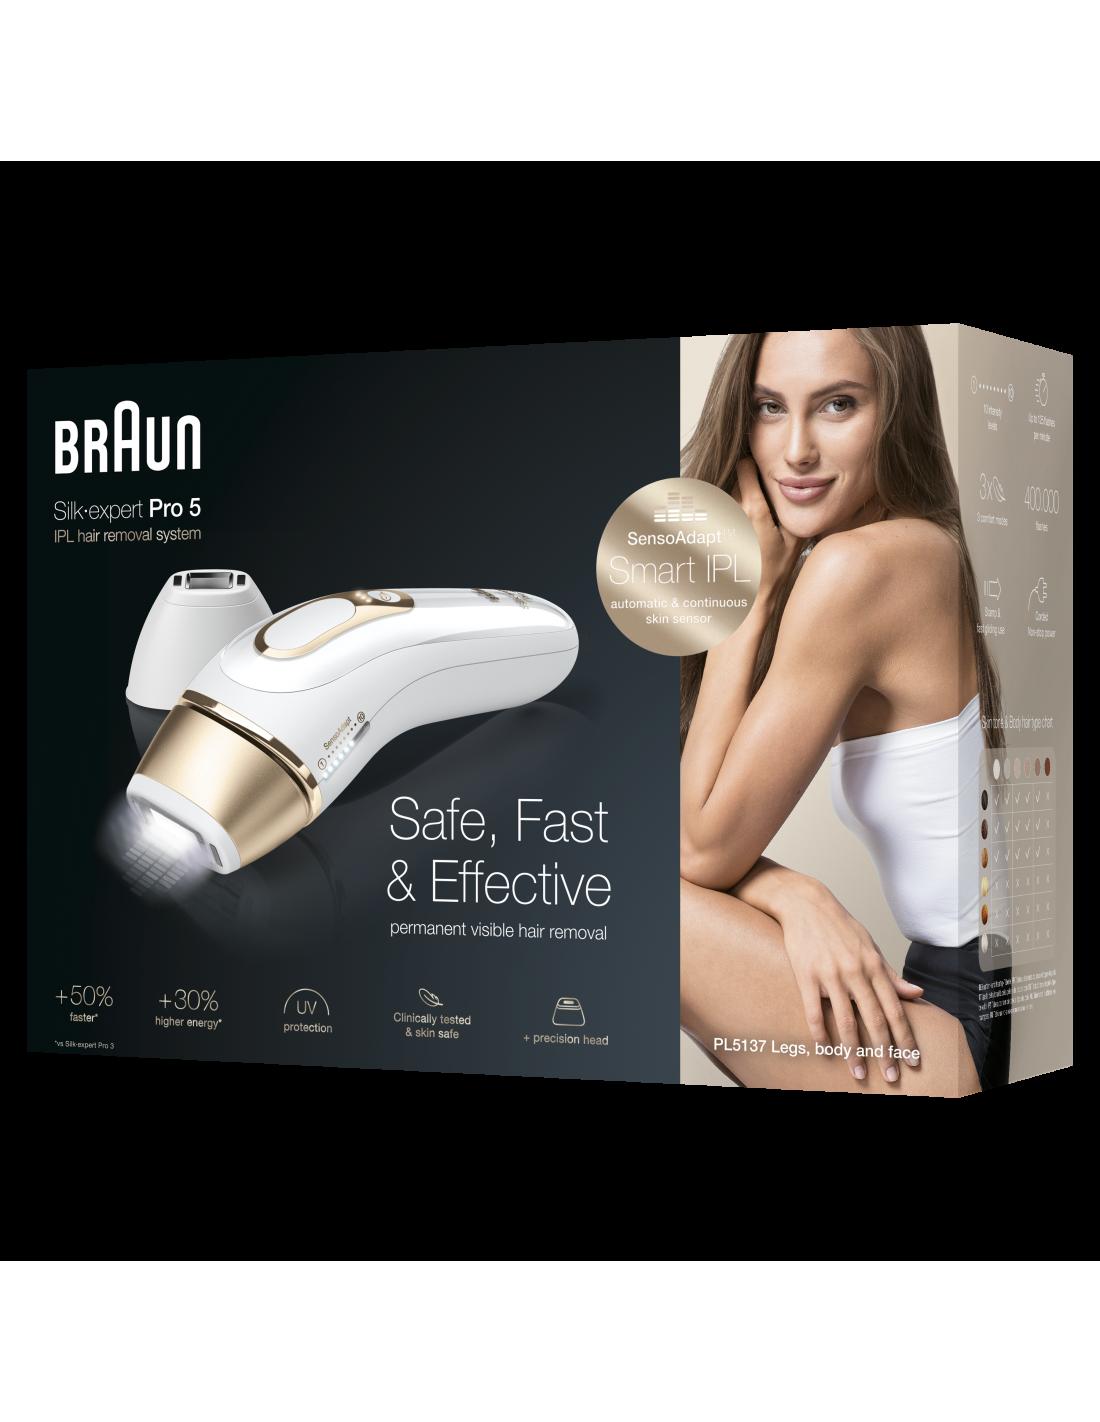 Braun Silk-expert Pro PL 5137 Epilators